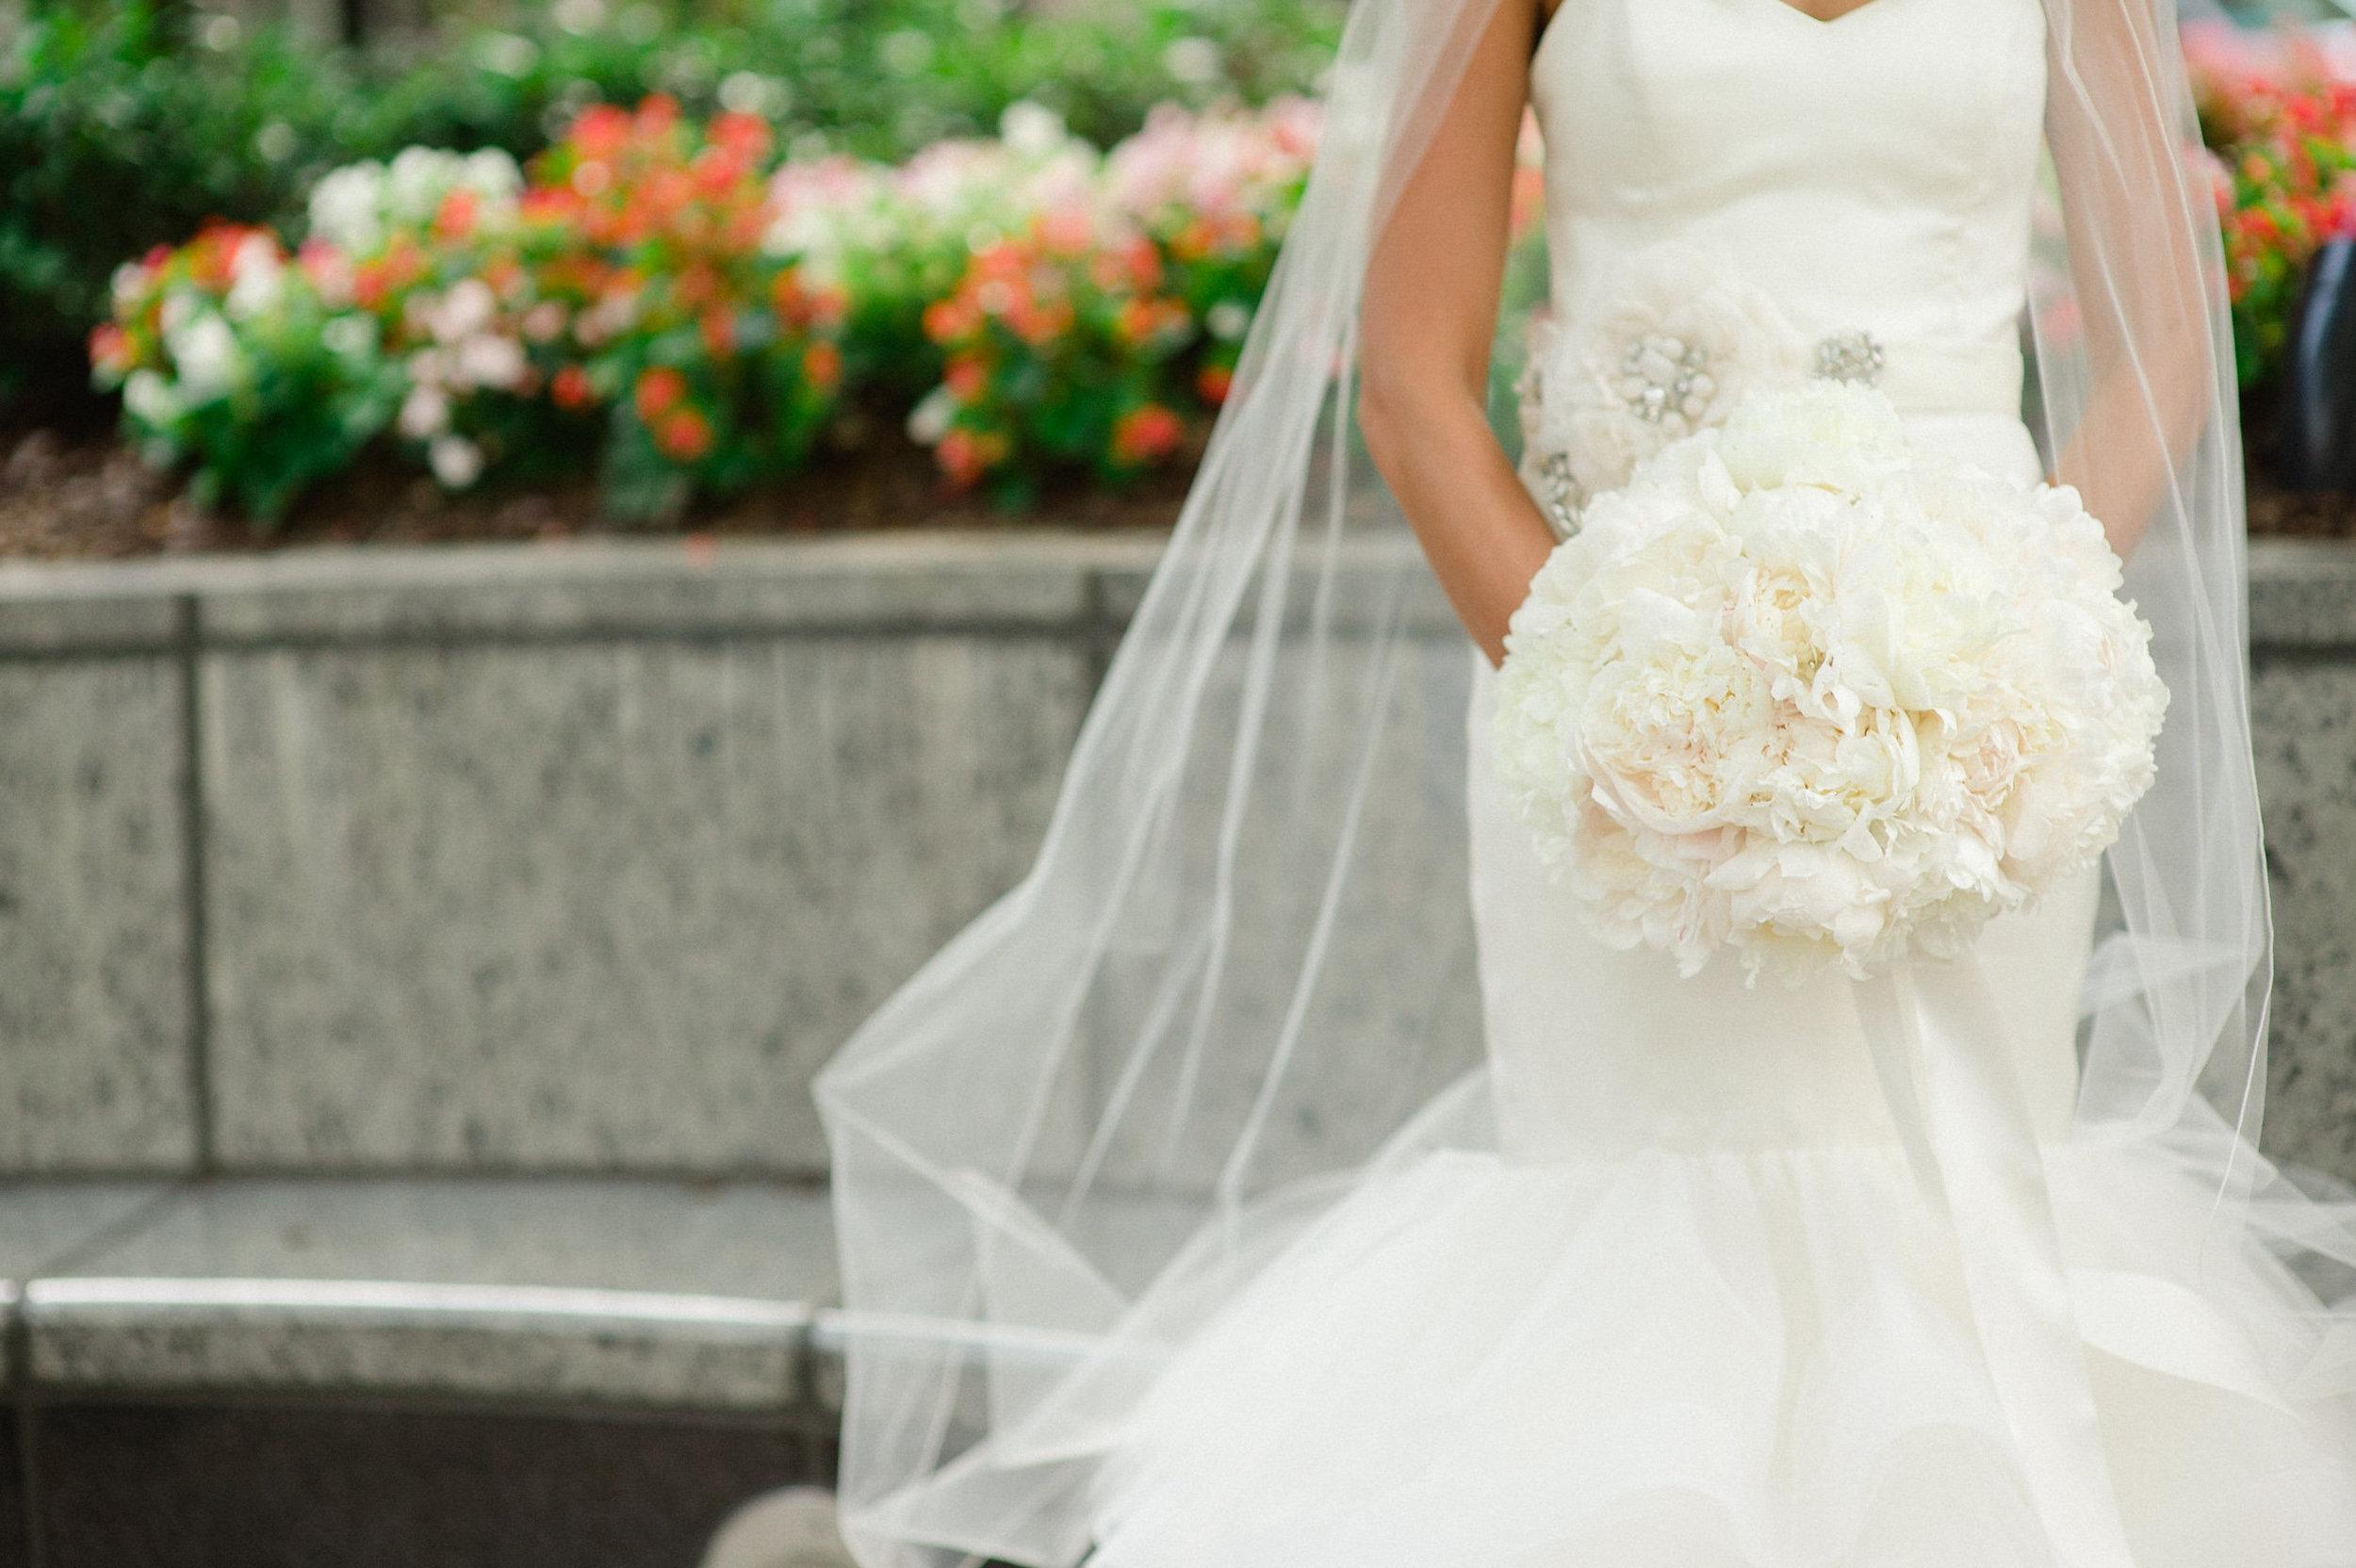 shelby&jordan|smitten&hooked|wedding|groups-132.jpg